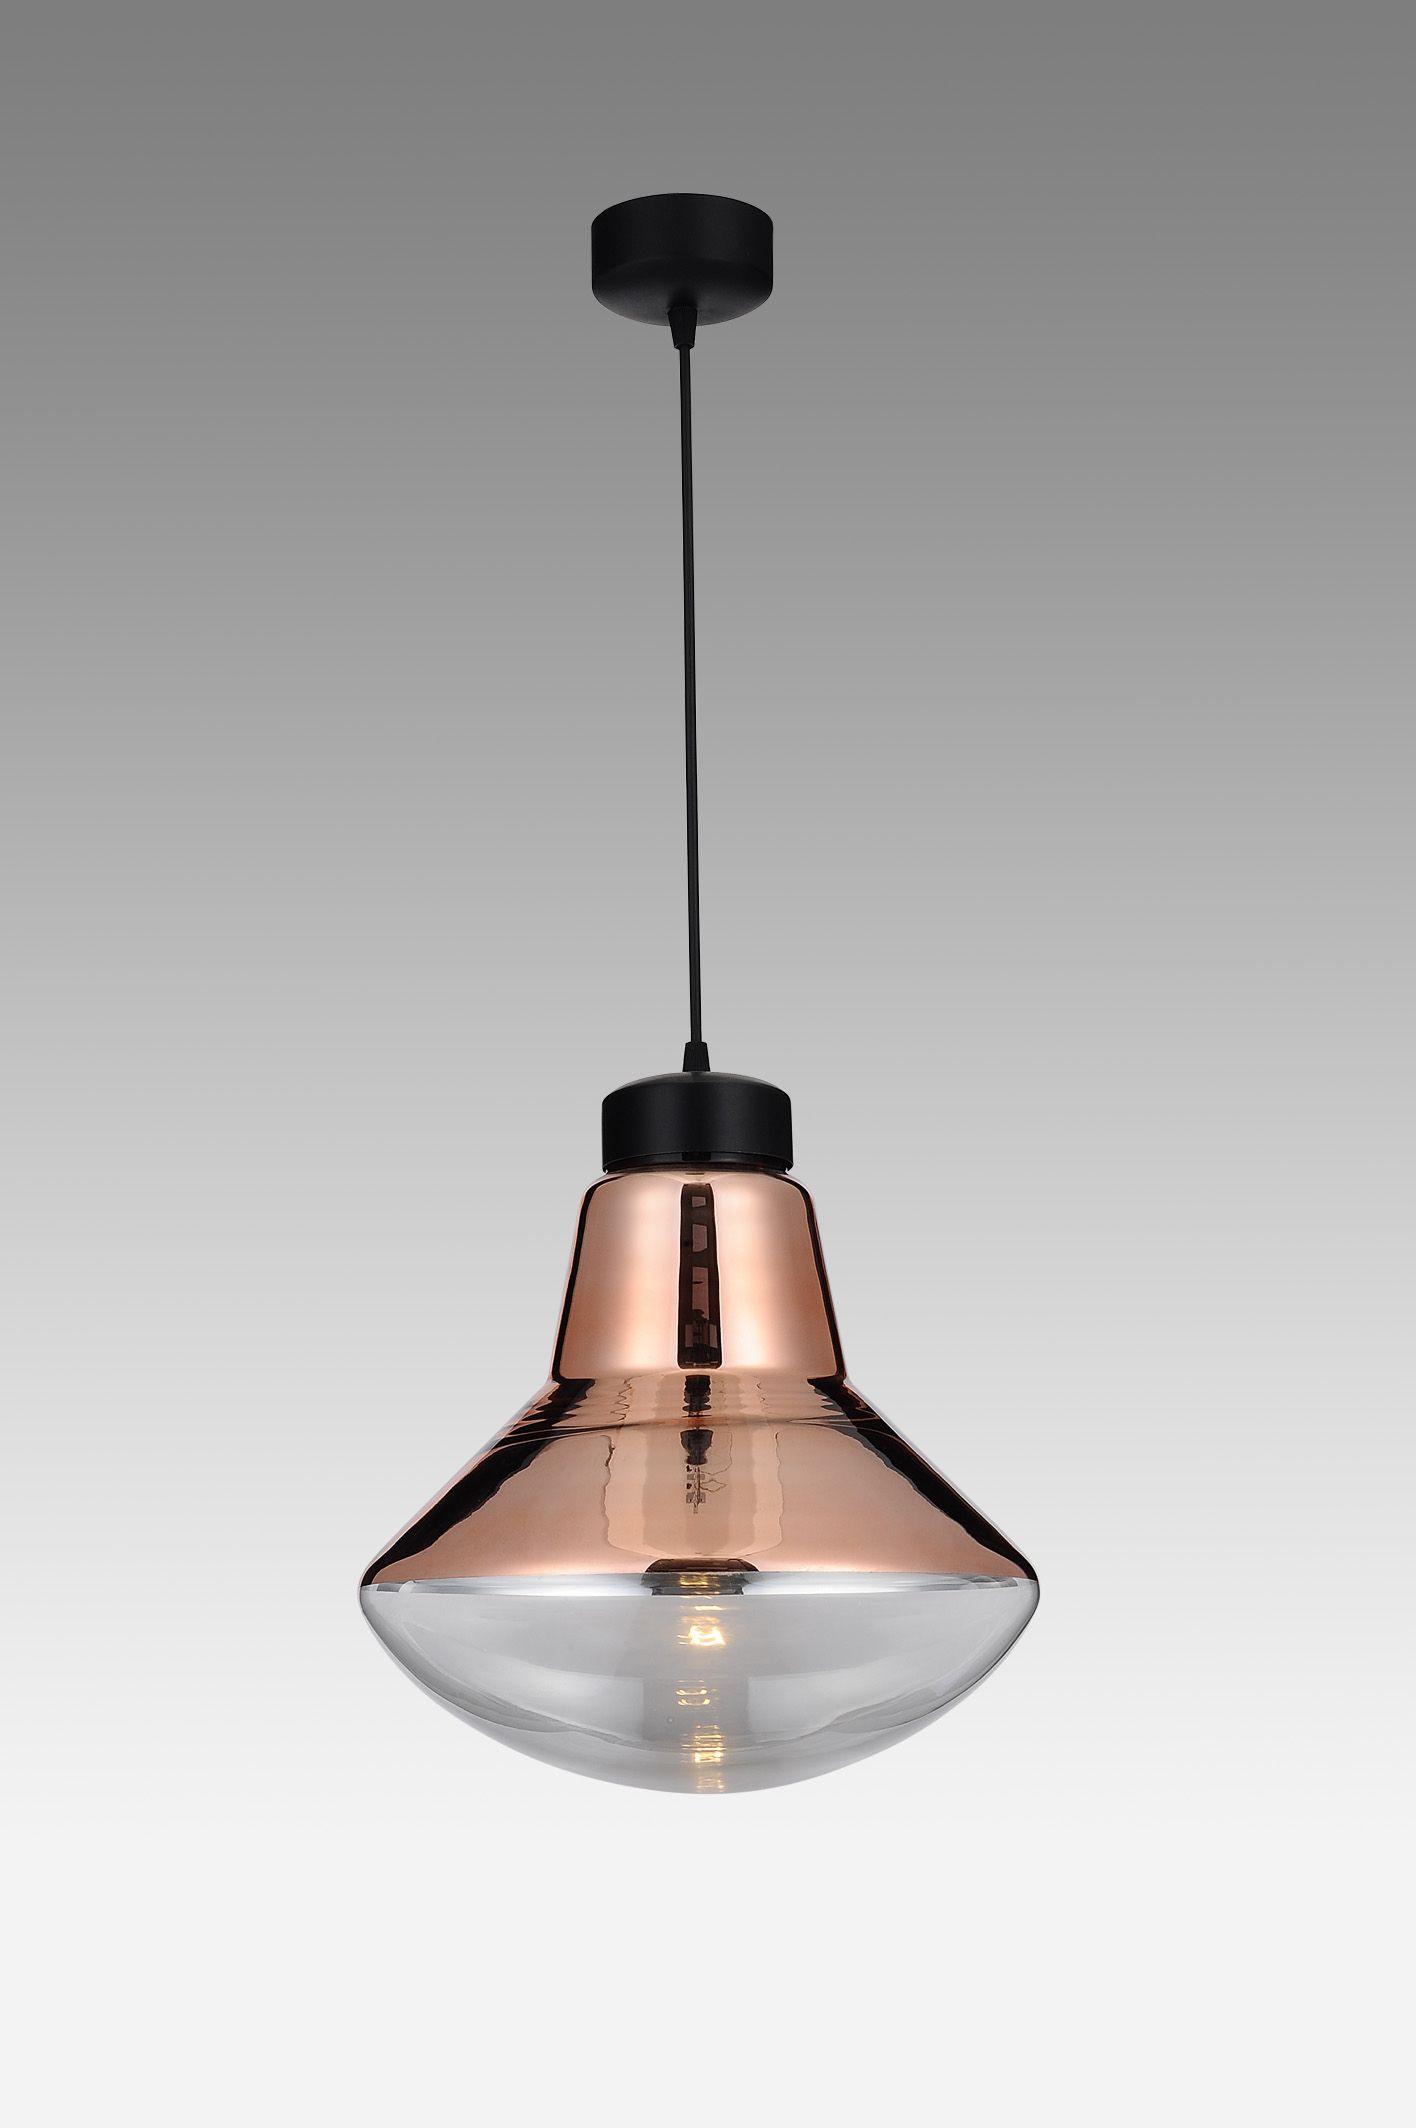 New Tom Dixon Pendant Lamp In Copper Color Tom Dixon Pendant Lamps Pendant Lamp Tom Dixon Pendant